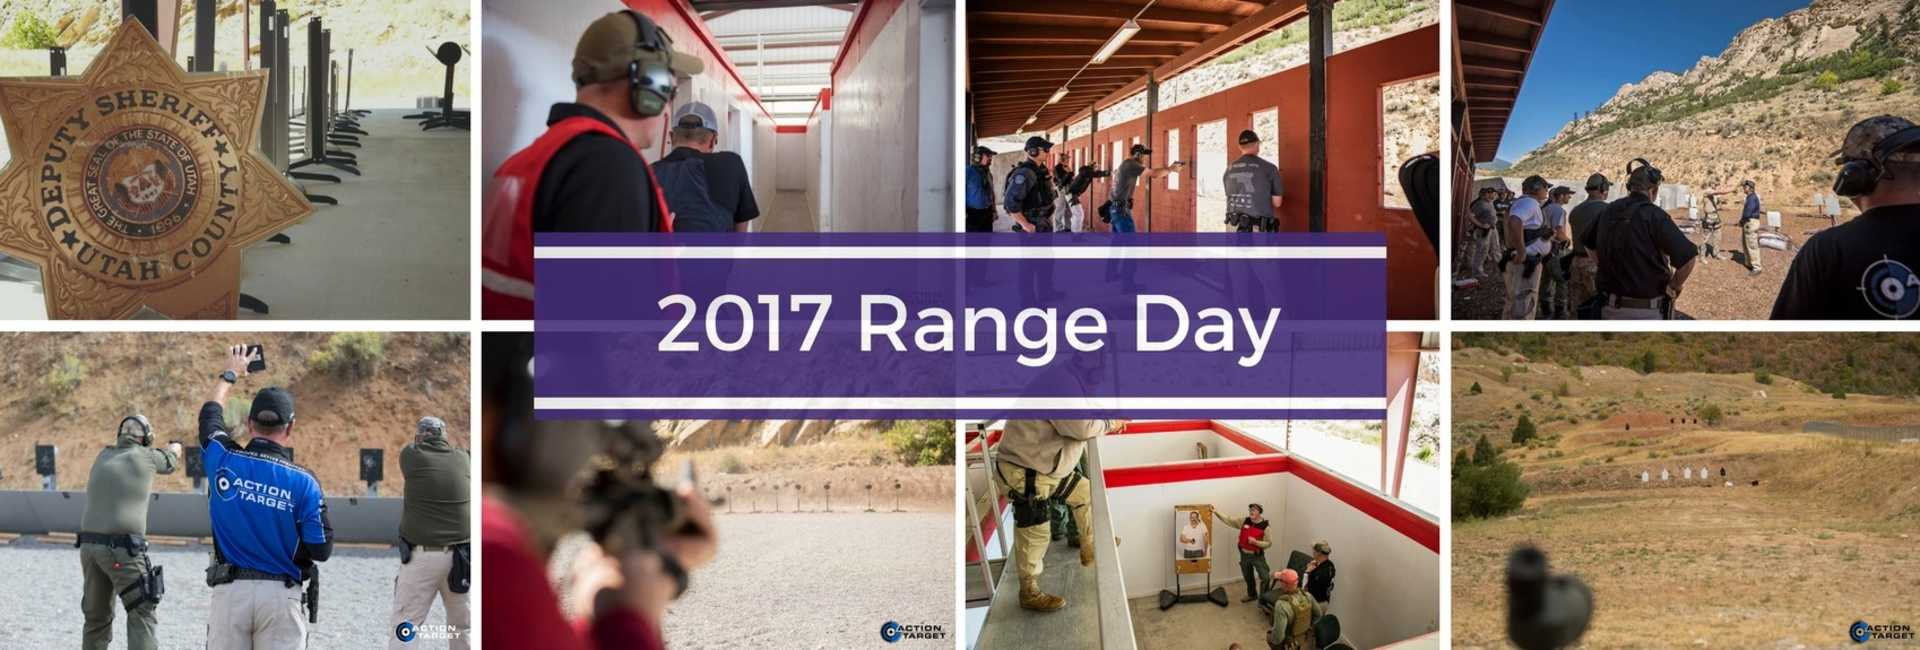 2017 Range Day